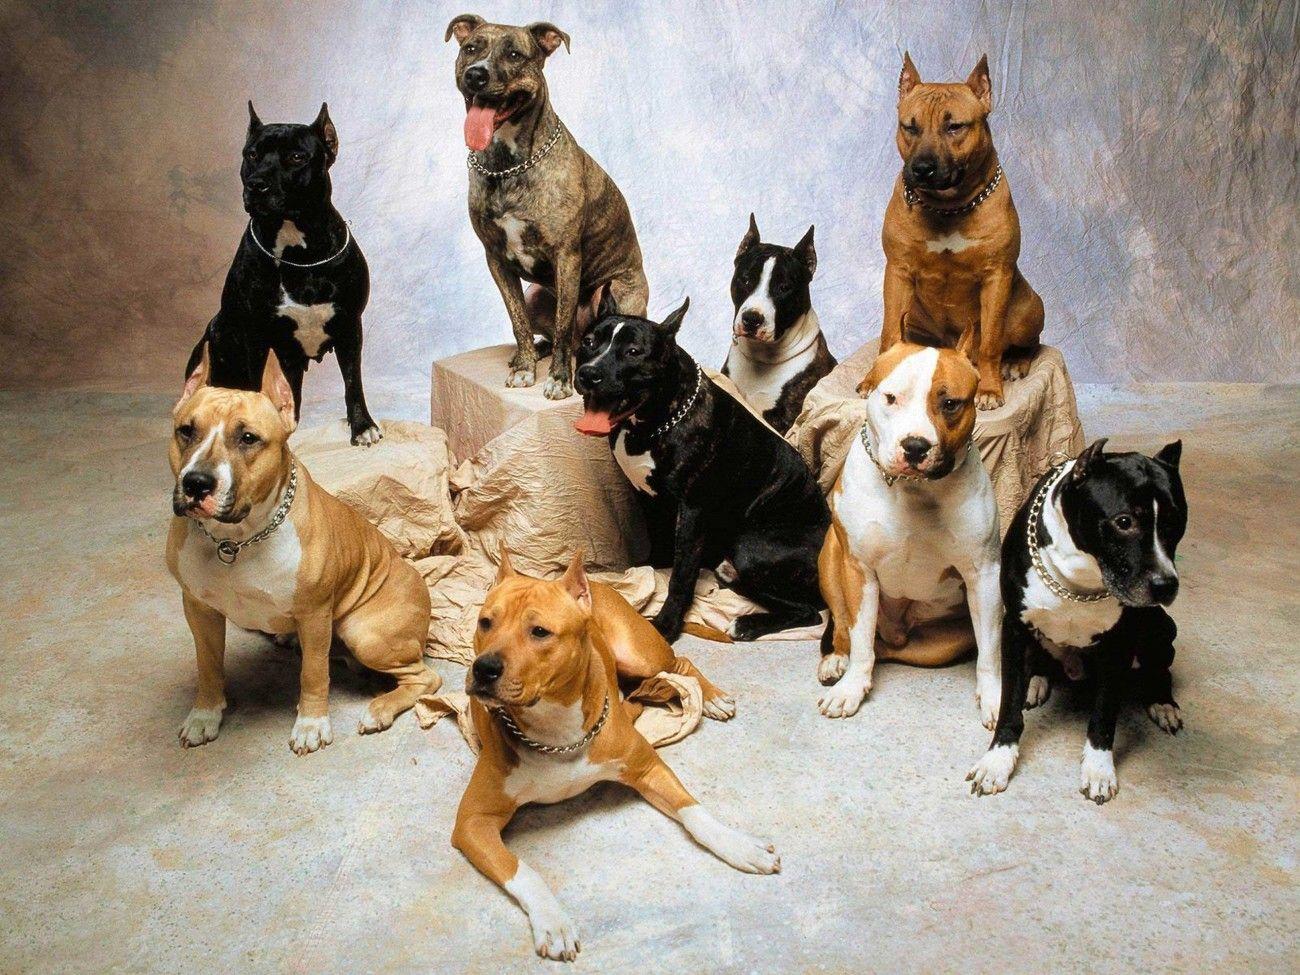 Pitbull American Staffordshire Terrier Wallpaper Pitbull Dog Breed Pitbull Dog Australian Dog Breeds